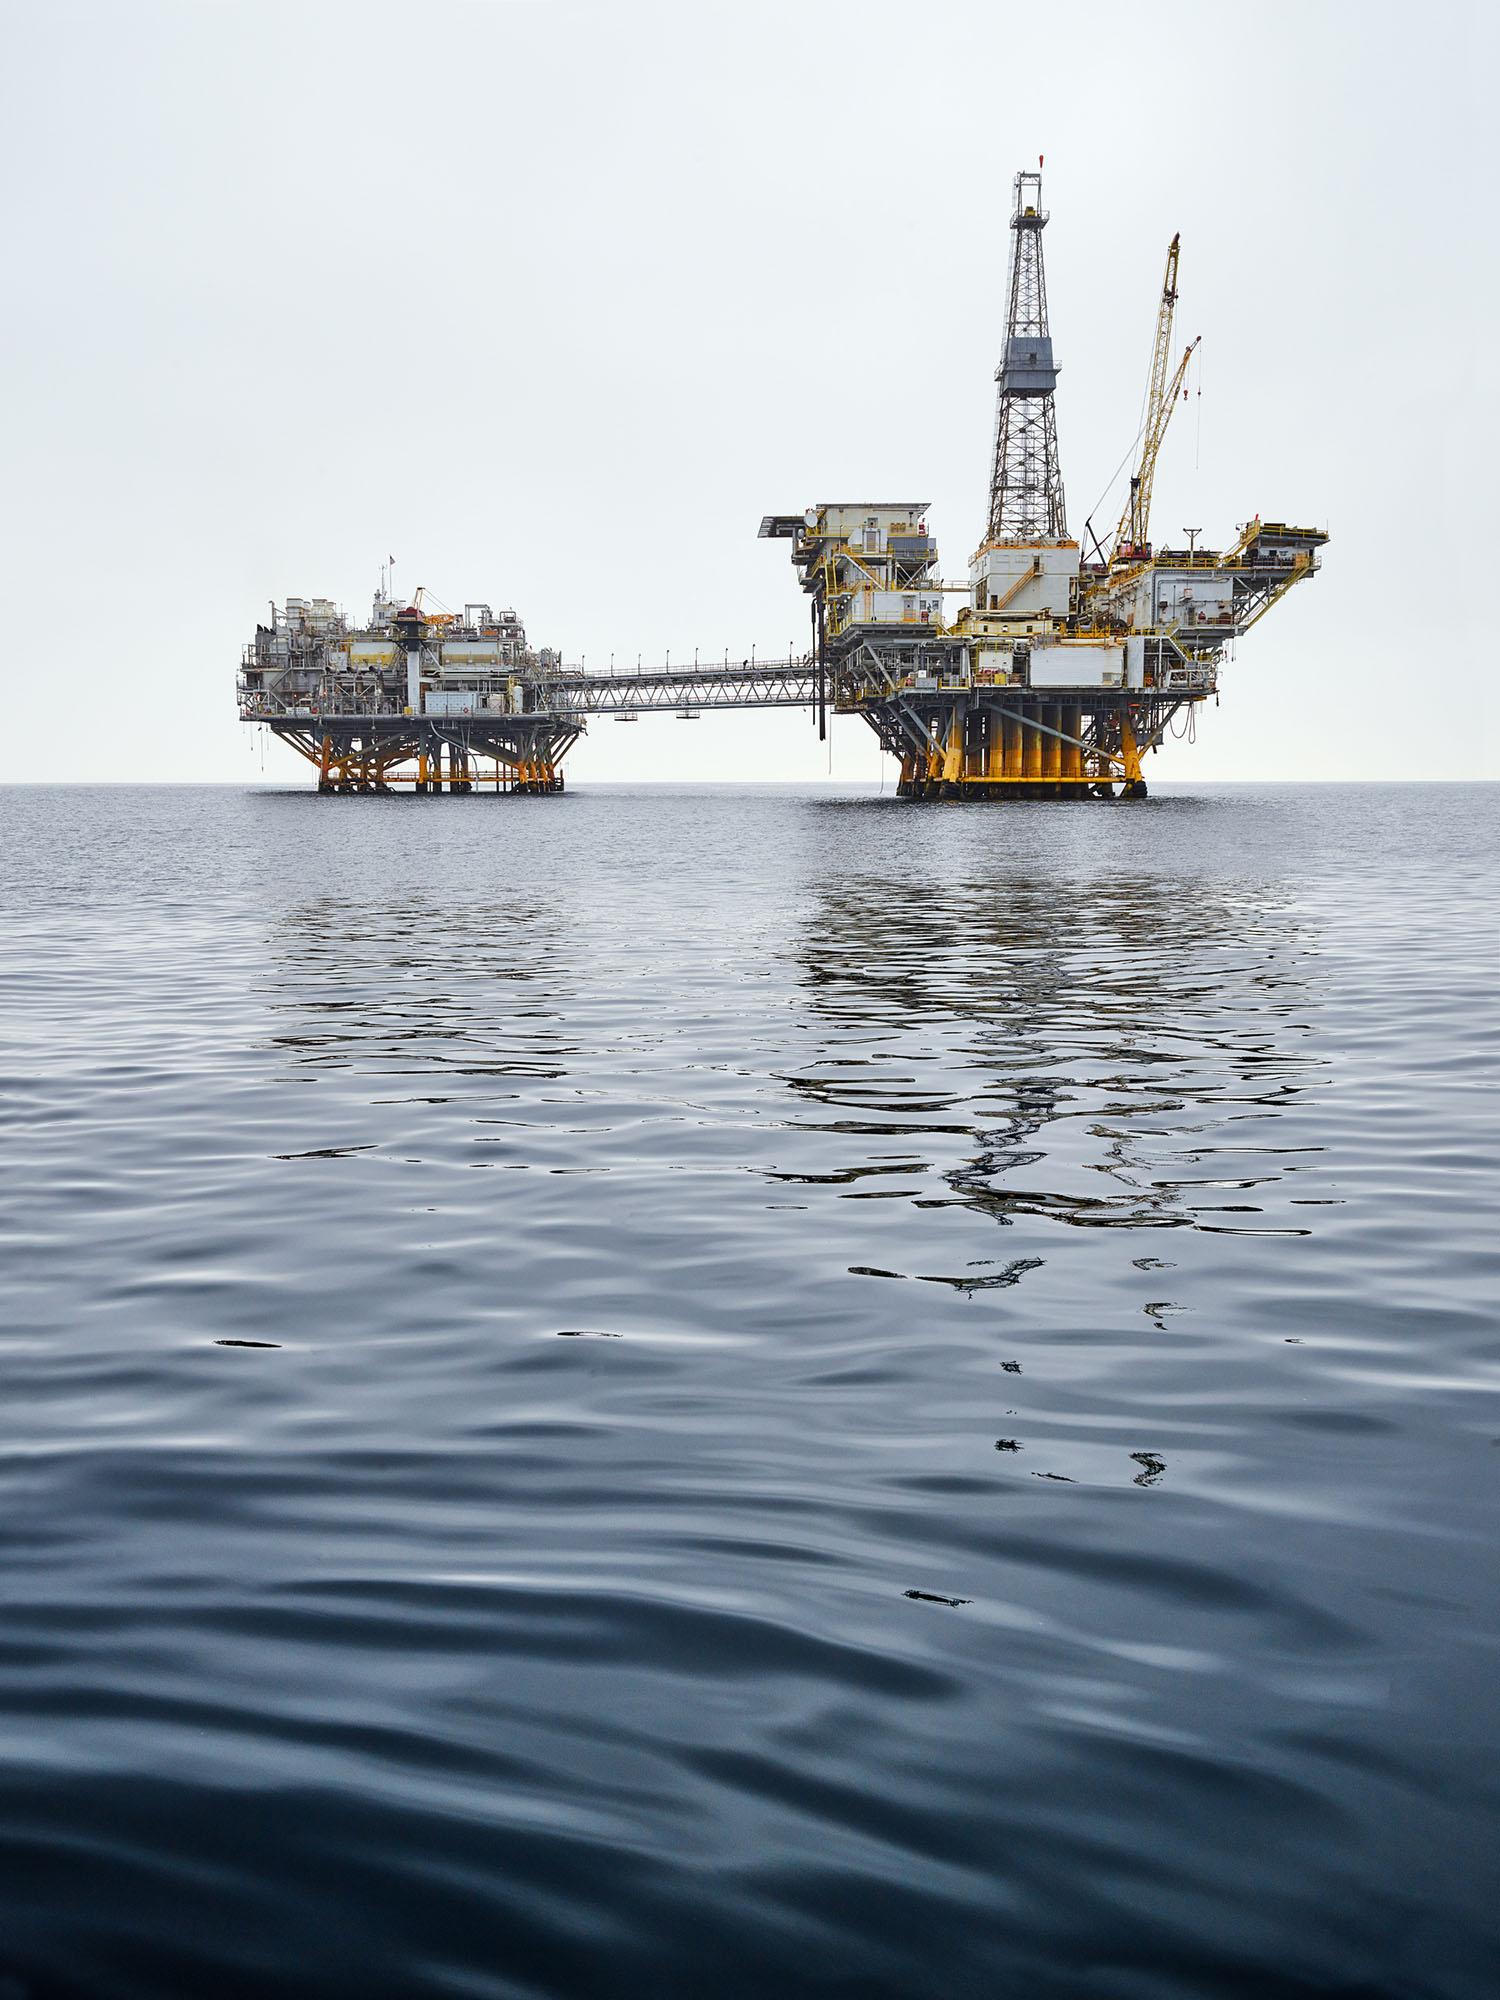 Offshore Oil Rig, Long Beach, California, 2016